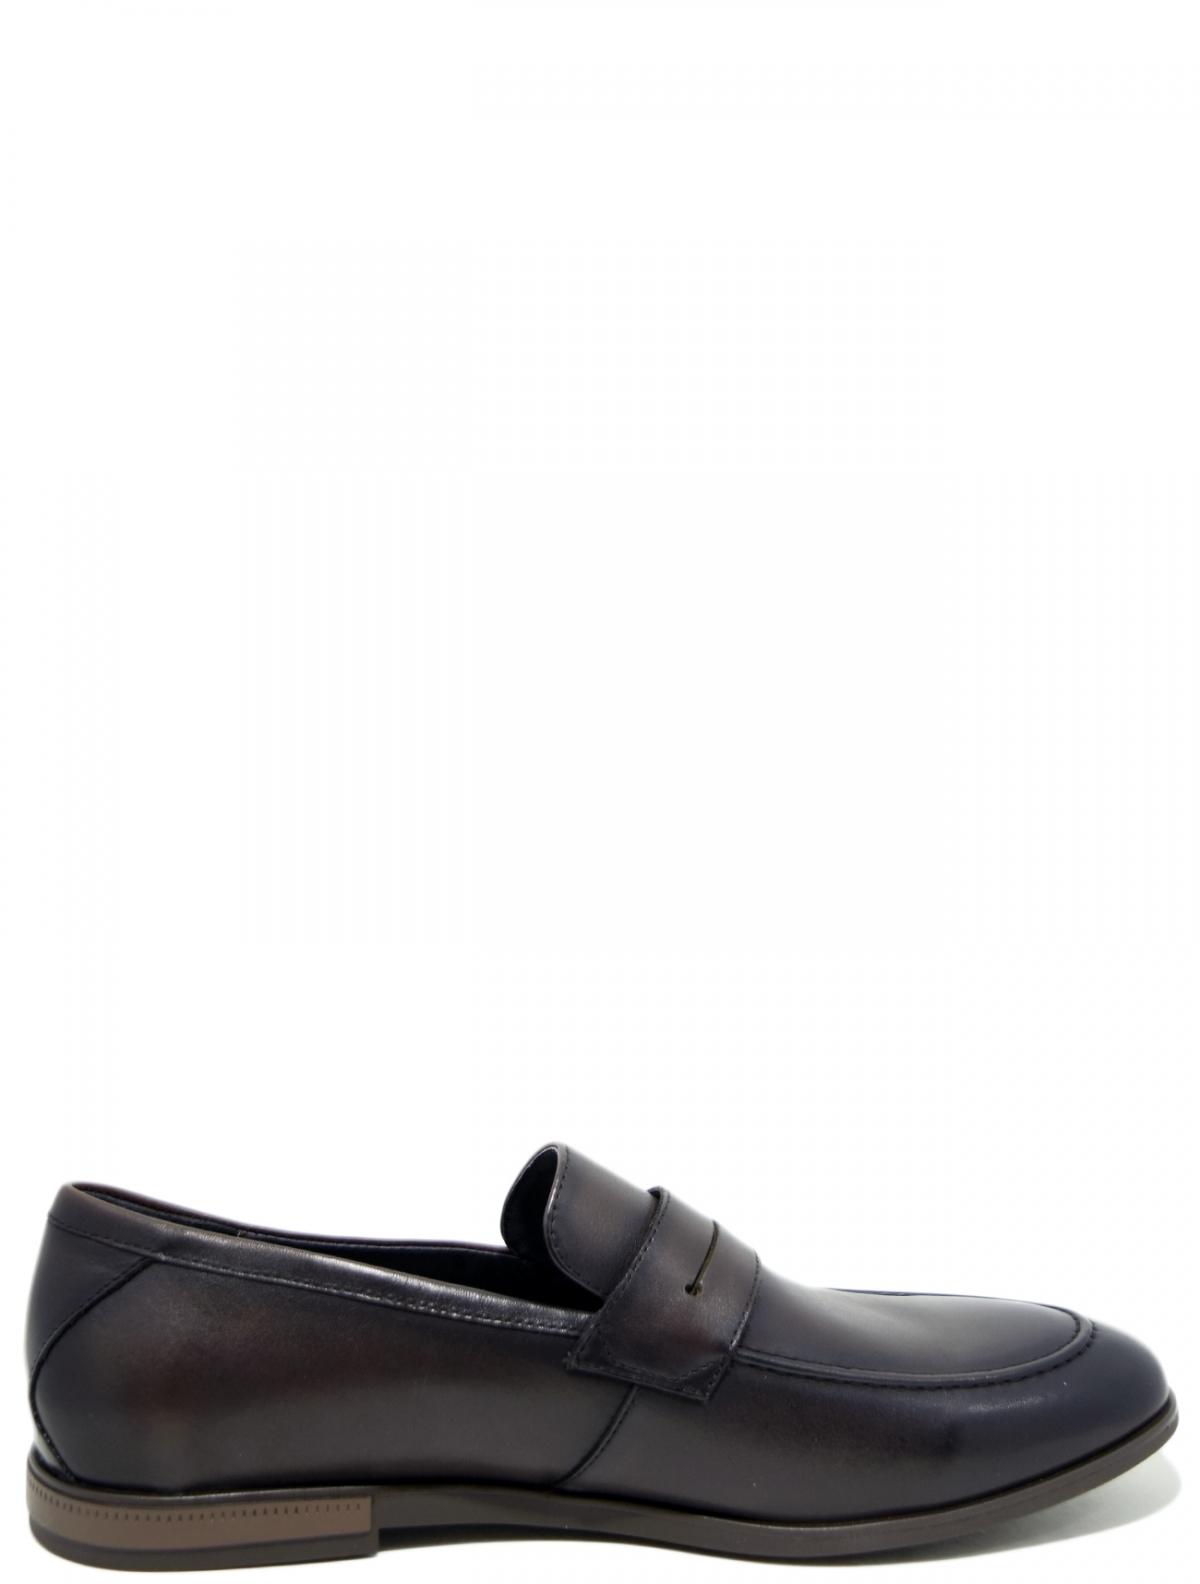 Roscote 91302-B52-T3145 мужские туфли